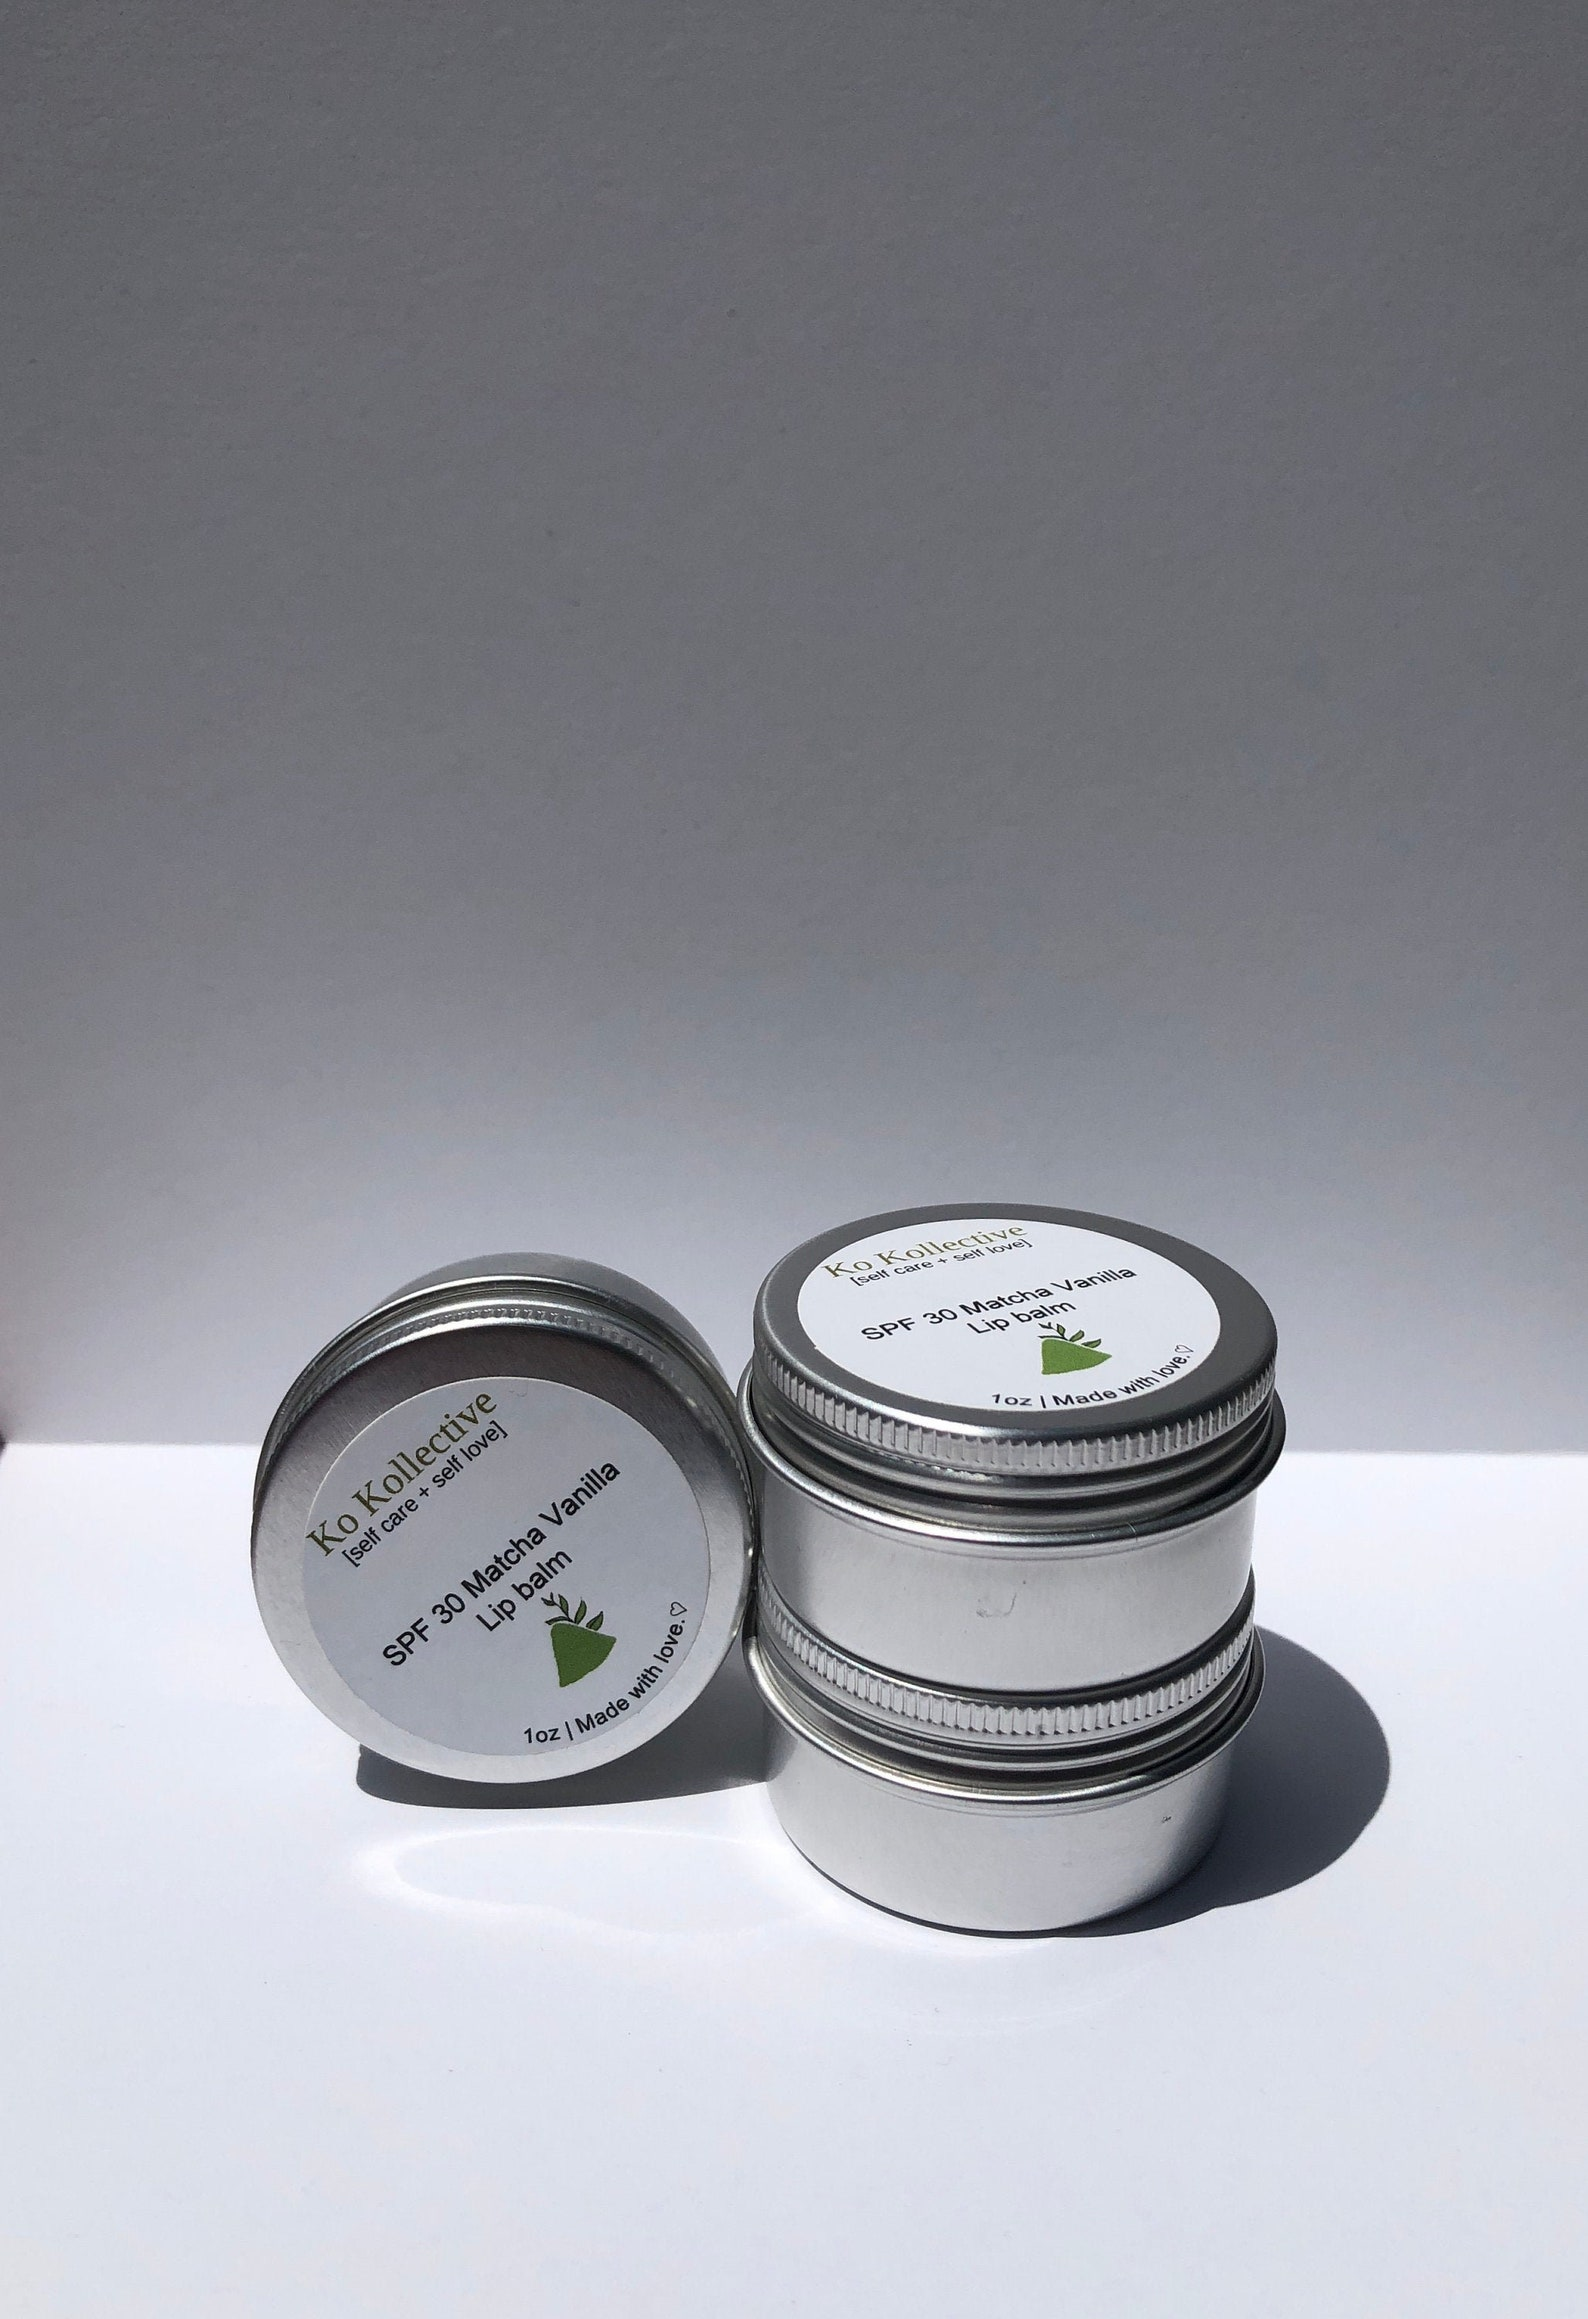 etsy.com - SPF 30 Matcha Vanilla Lip Balm